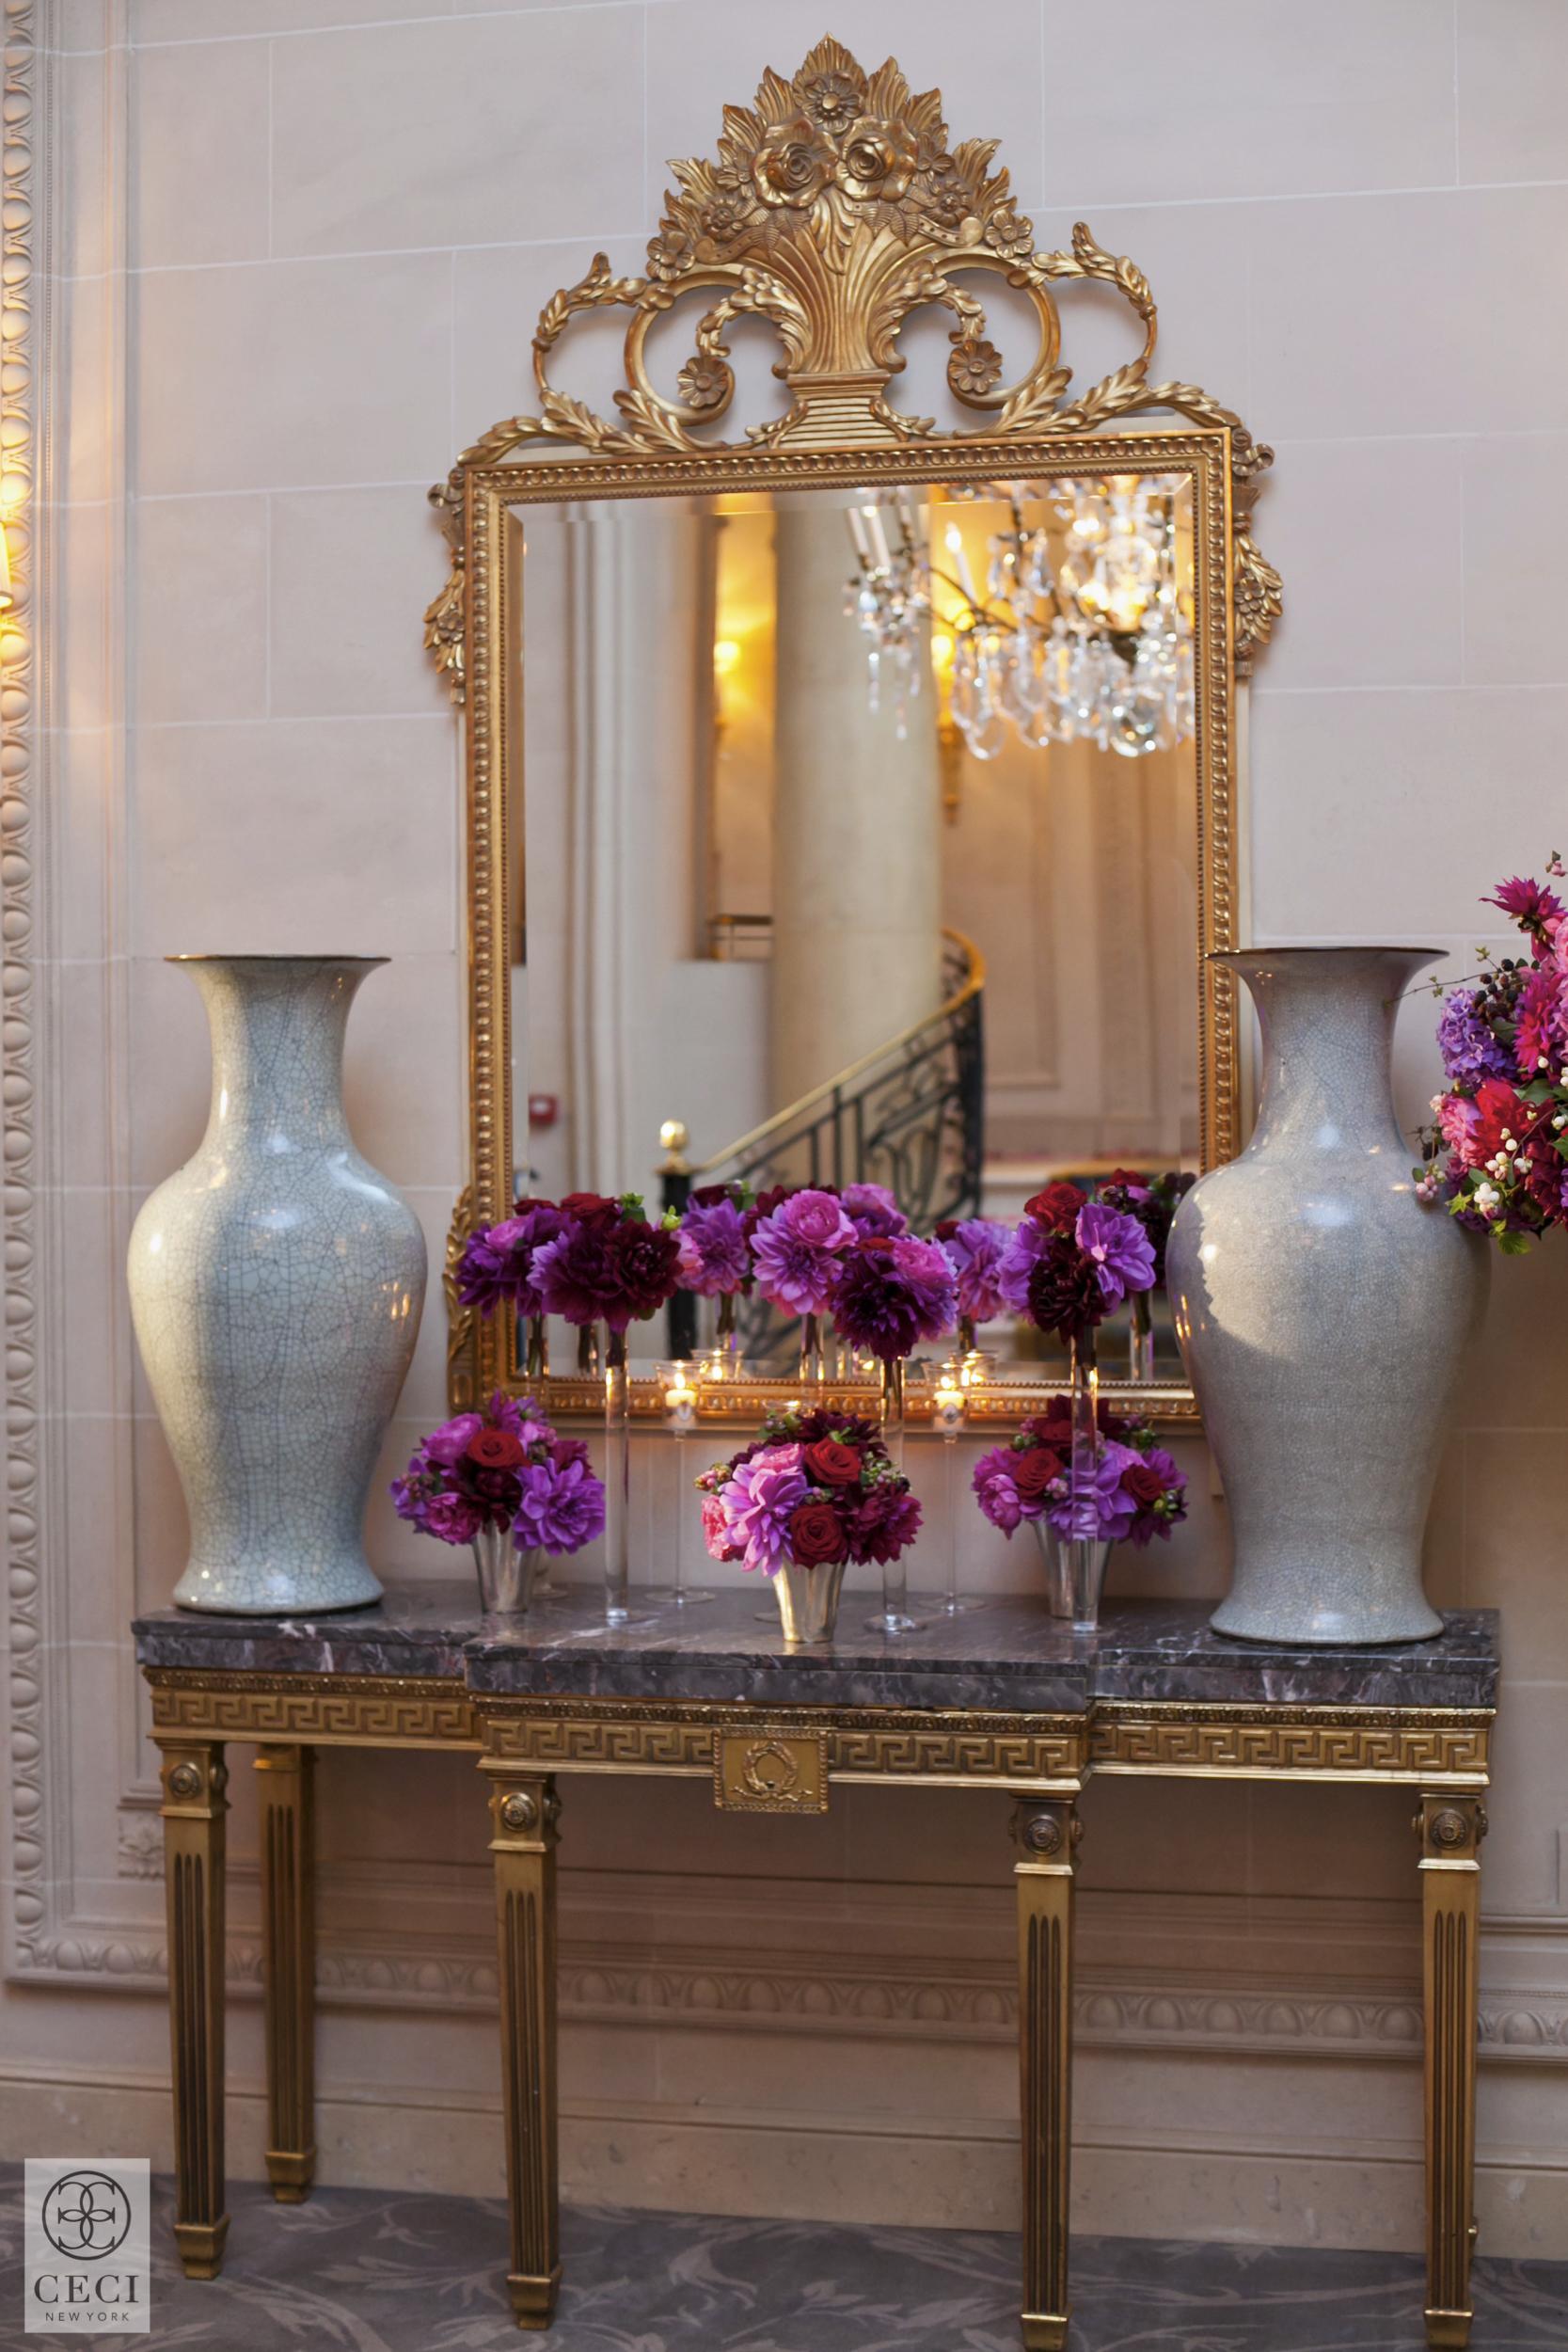 ceci_new_york_lucas_somoza_purple_regal_wediding_birthday_commitment_ceremony_gold-45.jpg